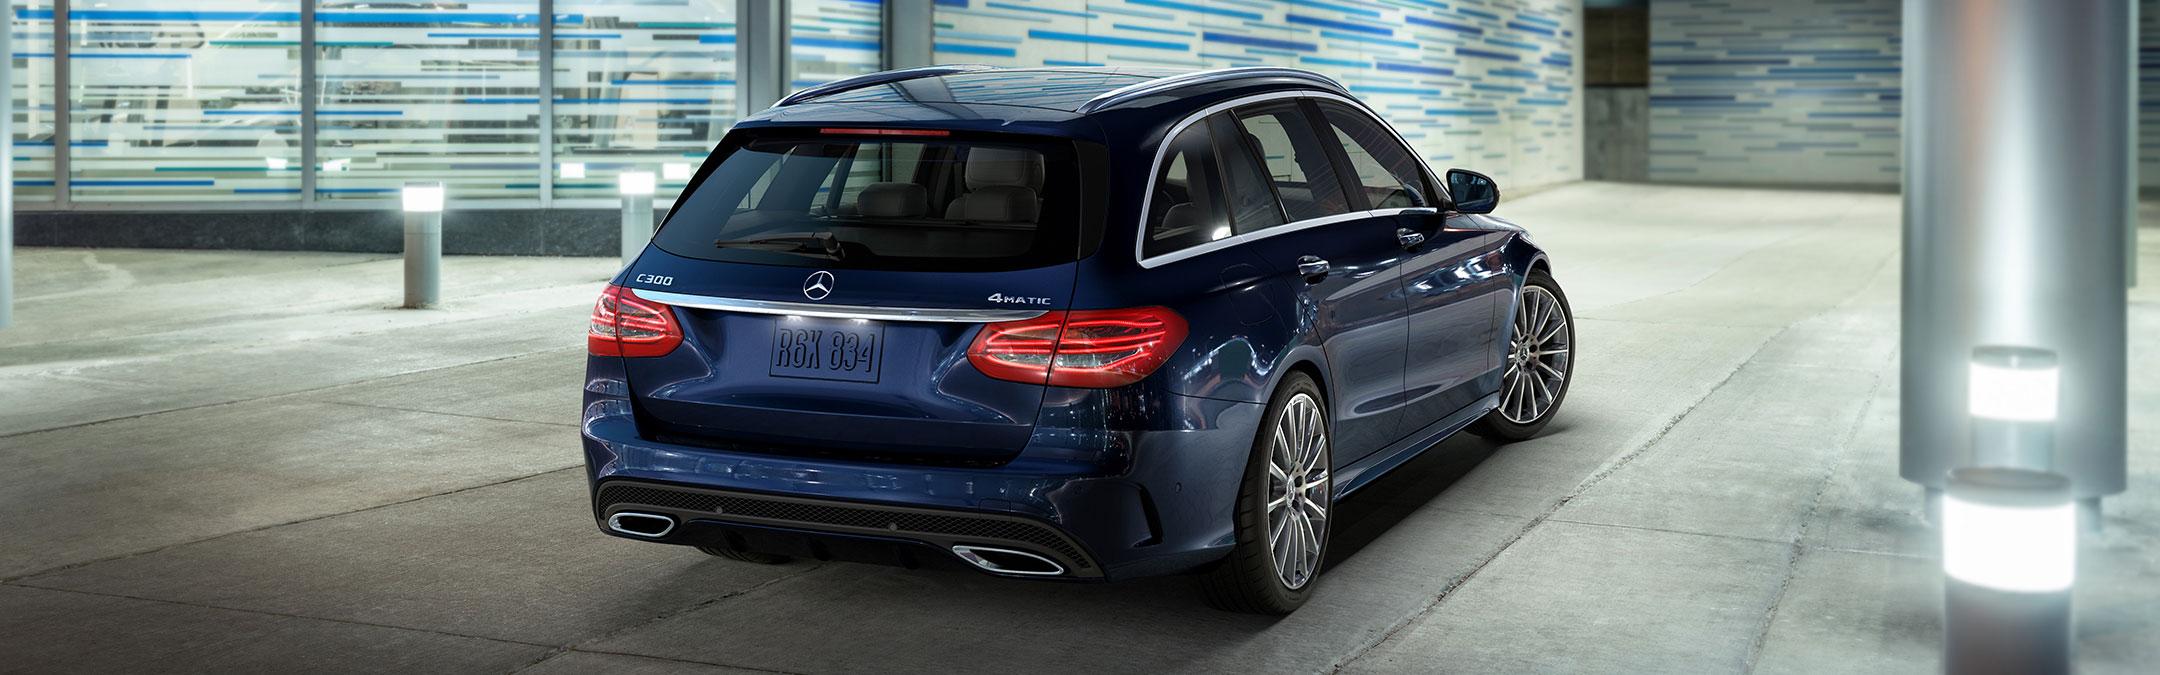 2018 c class wagon mercedes benz for Mercedes benz station wagon 2018